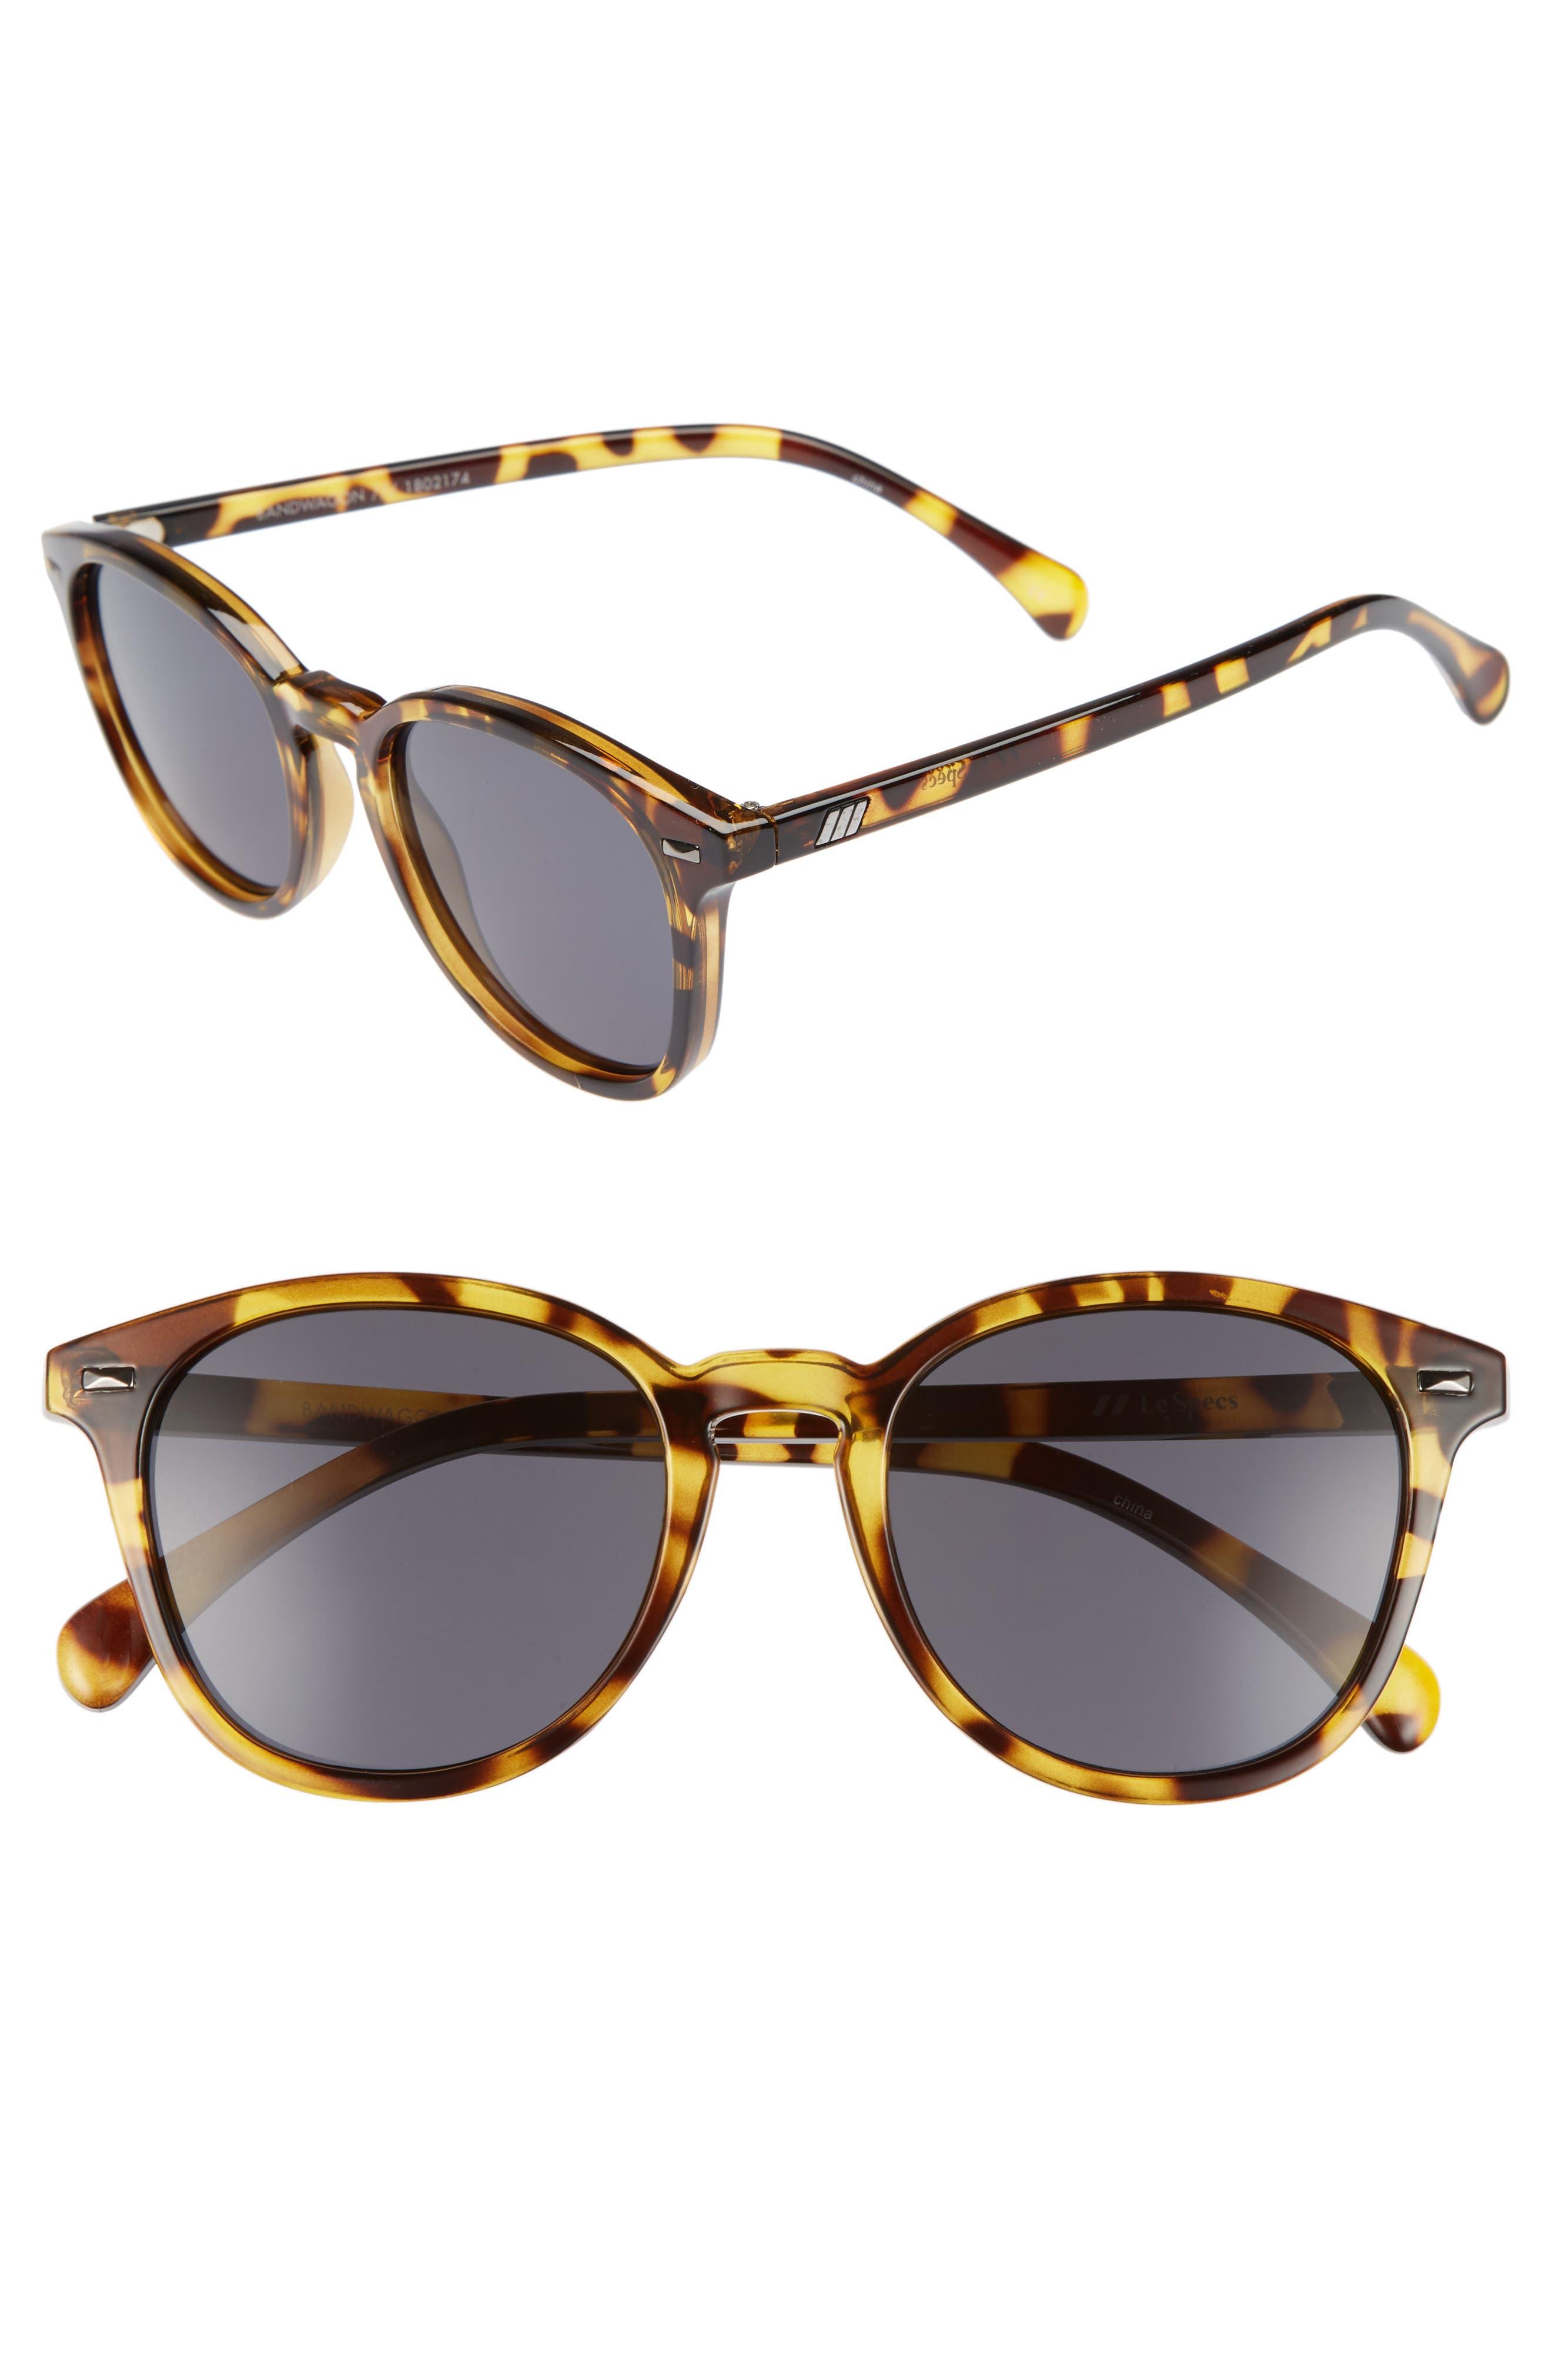 Bandwagon 50mm Sunglasses,                             Main thumbnail 1, color,                             SYRUP TORTOISE